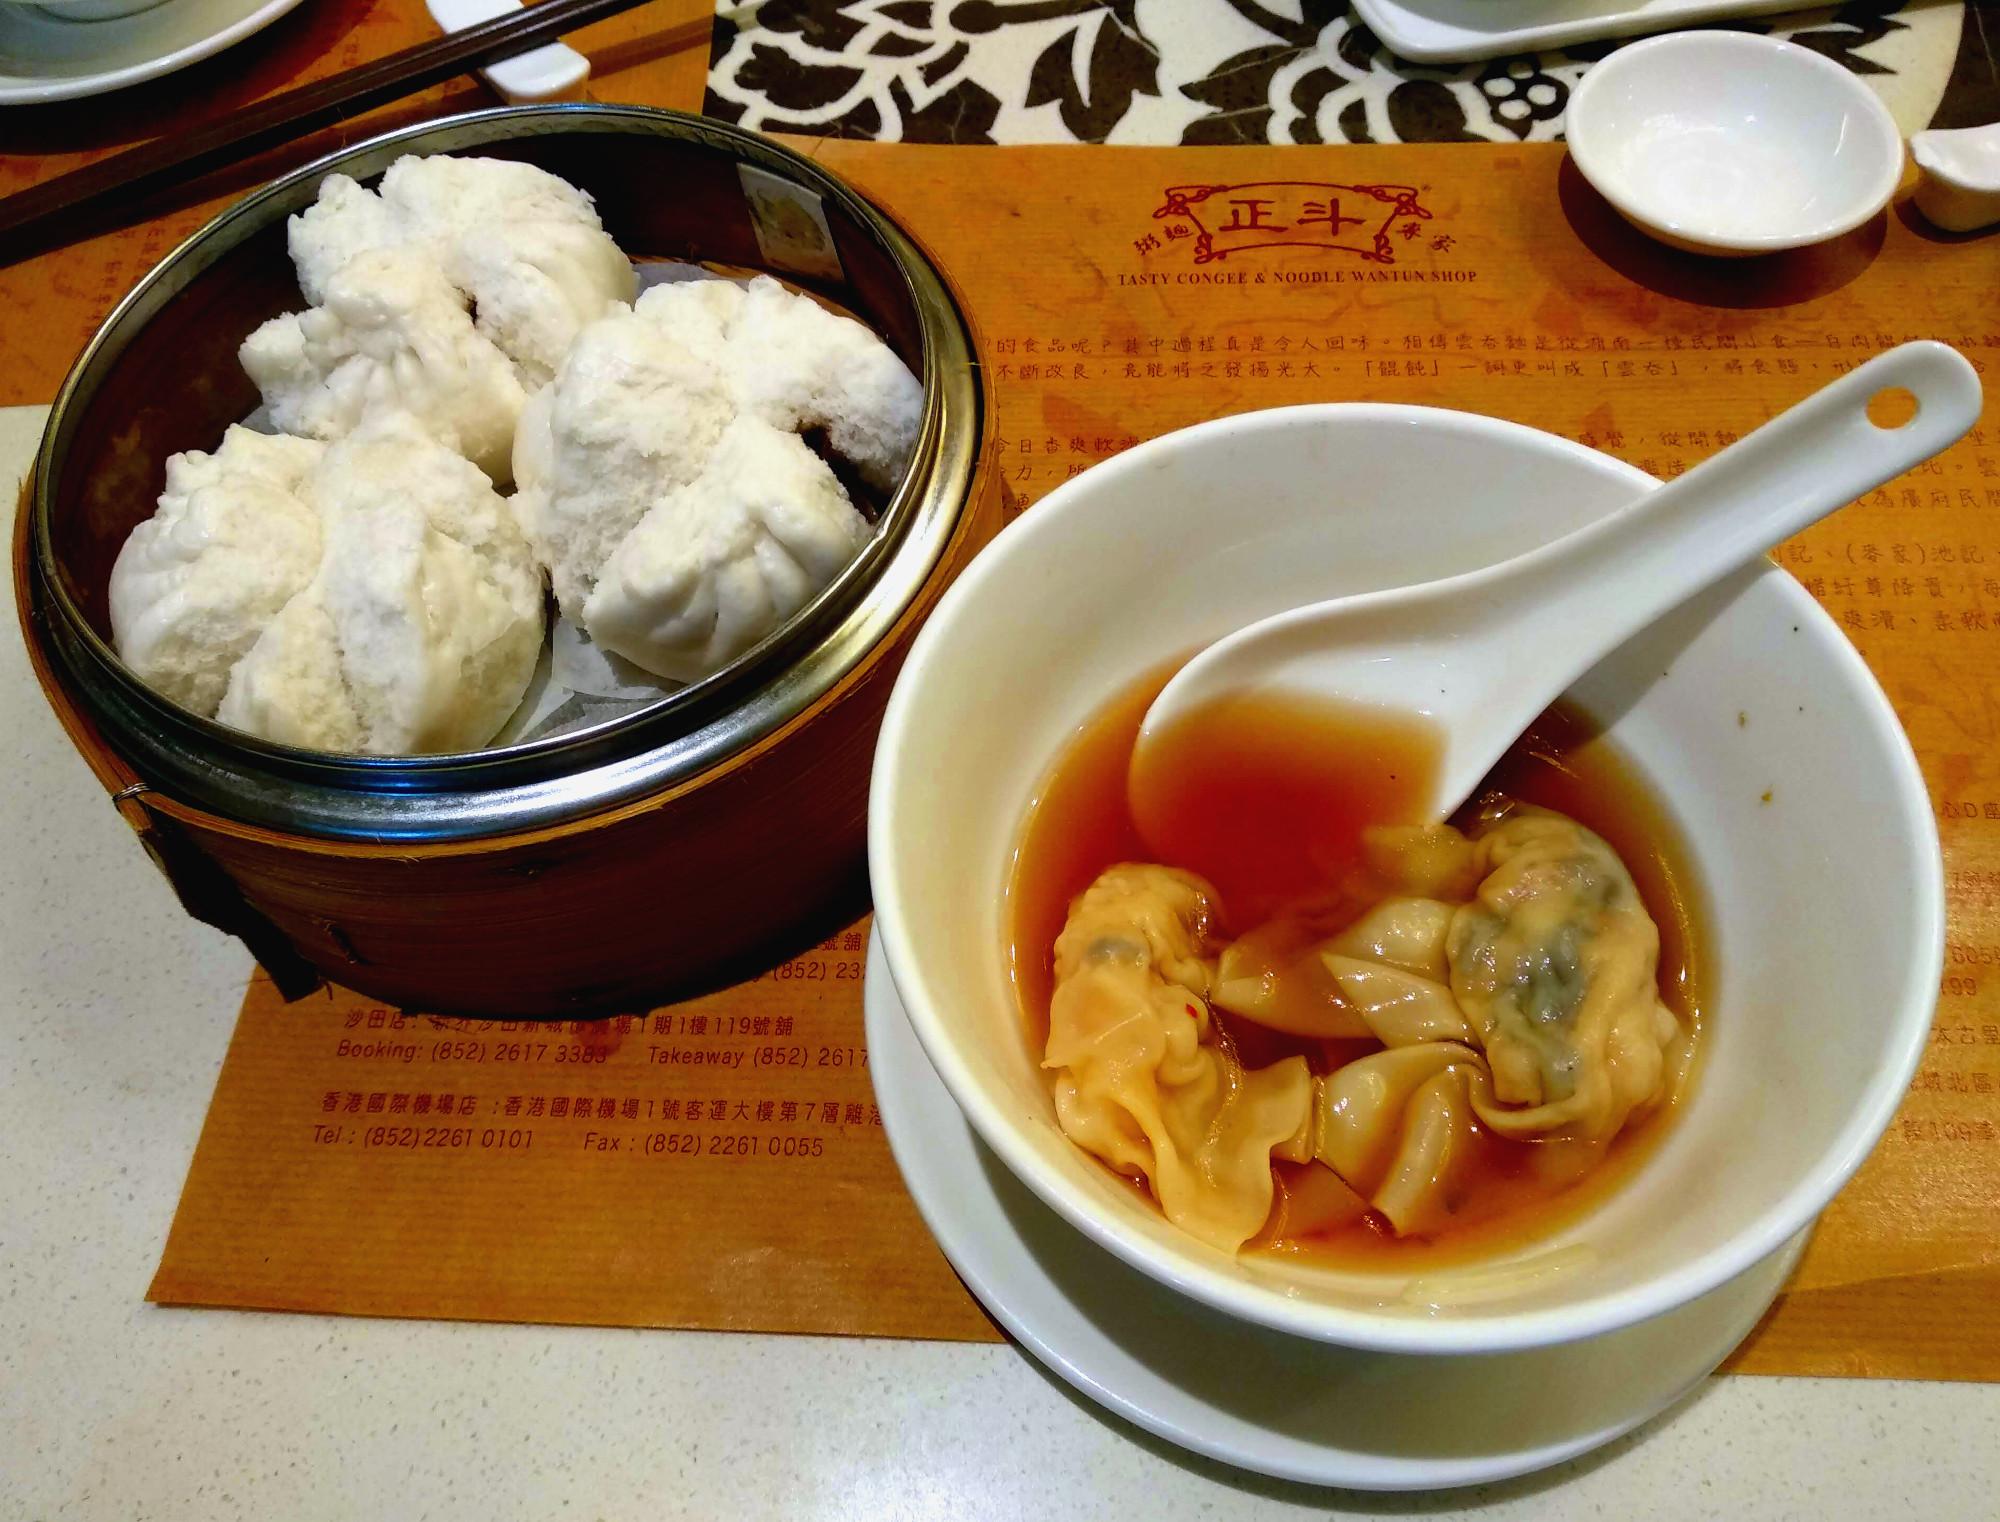 Tasty Congee & Wan Tan